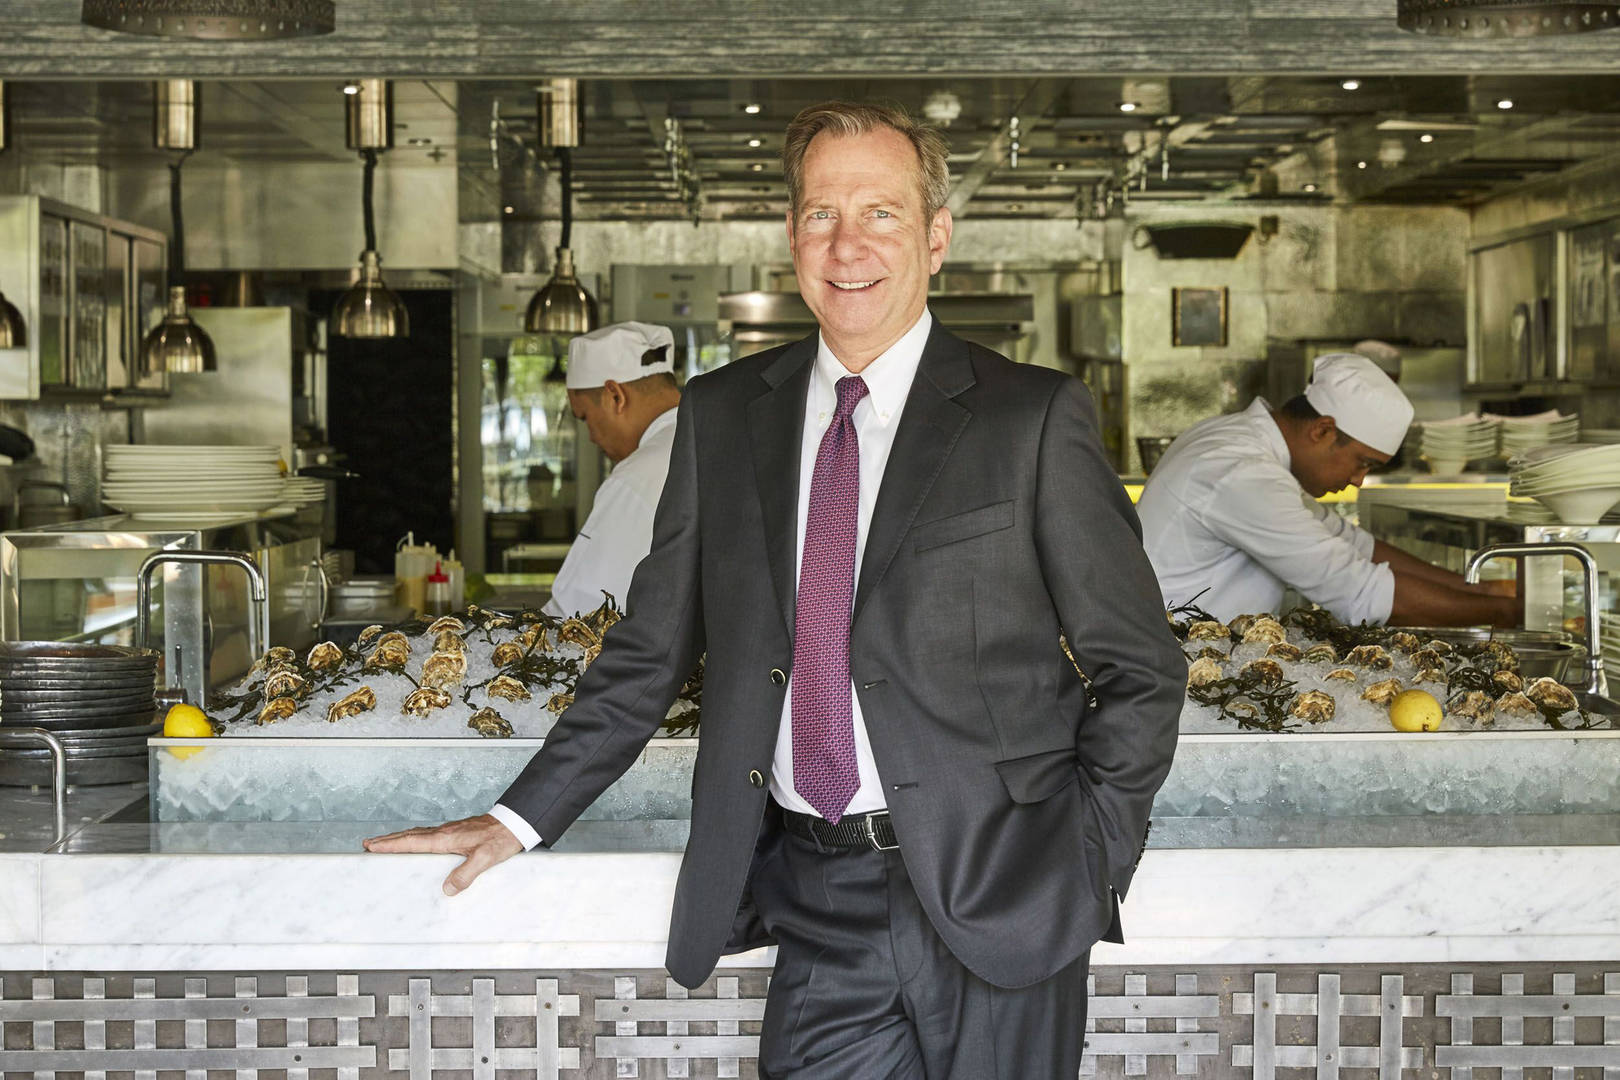 Officer Michael-Ellis Murrindie at Jumeirah Group Chief Culinary